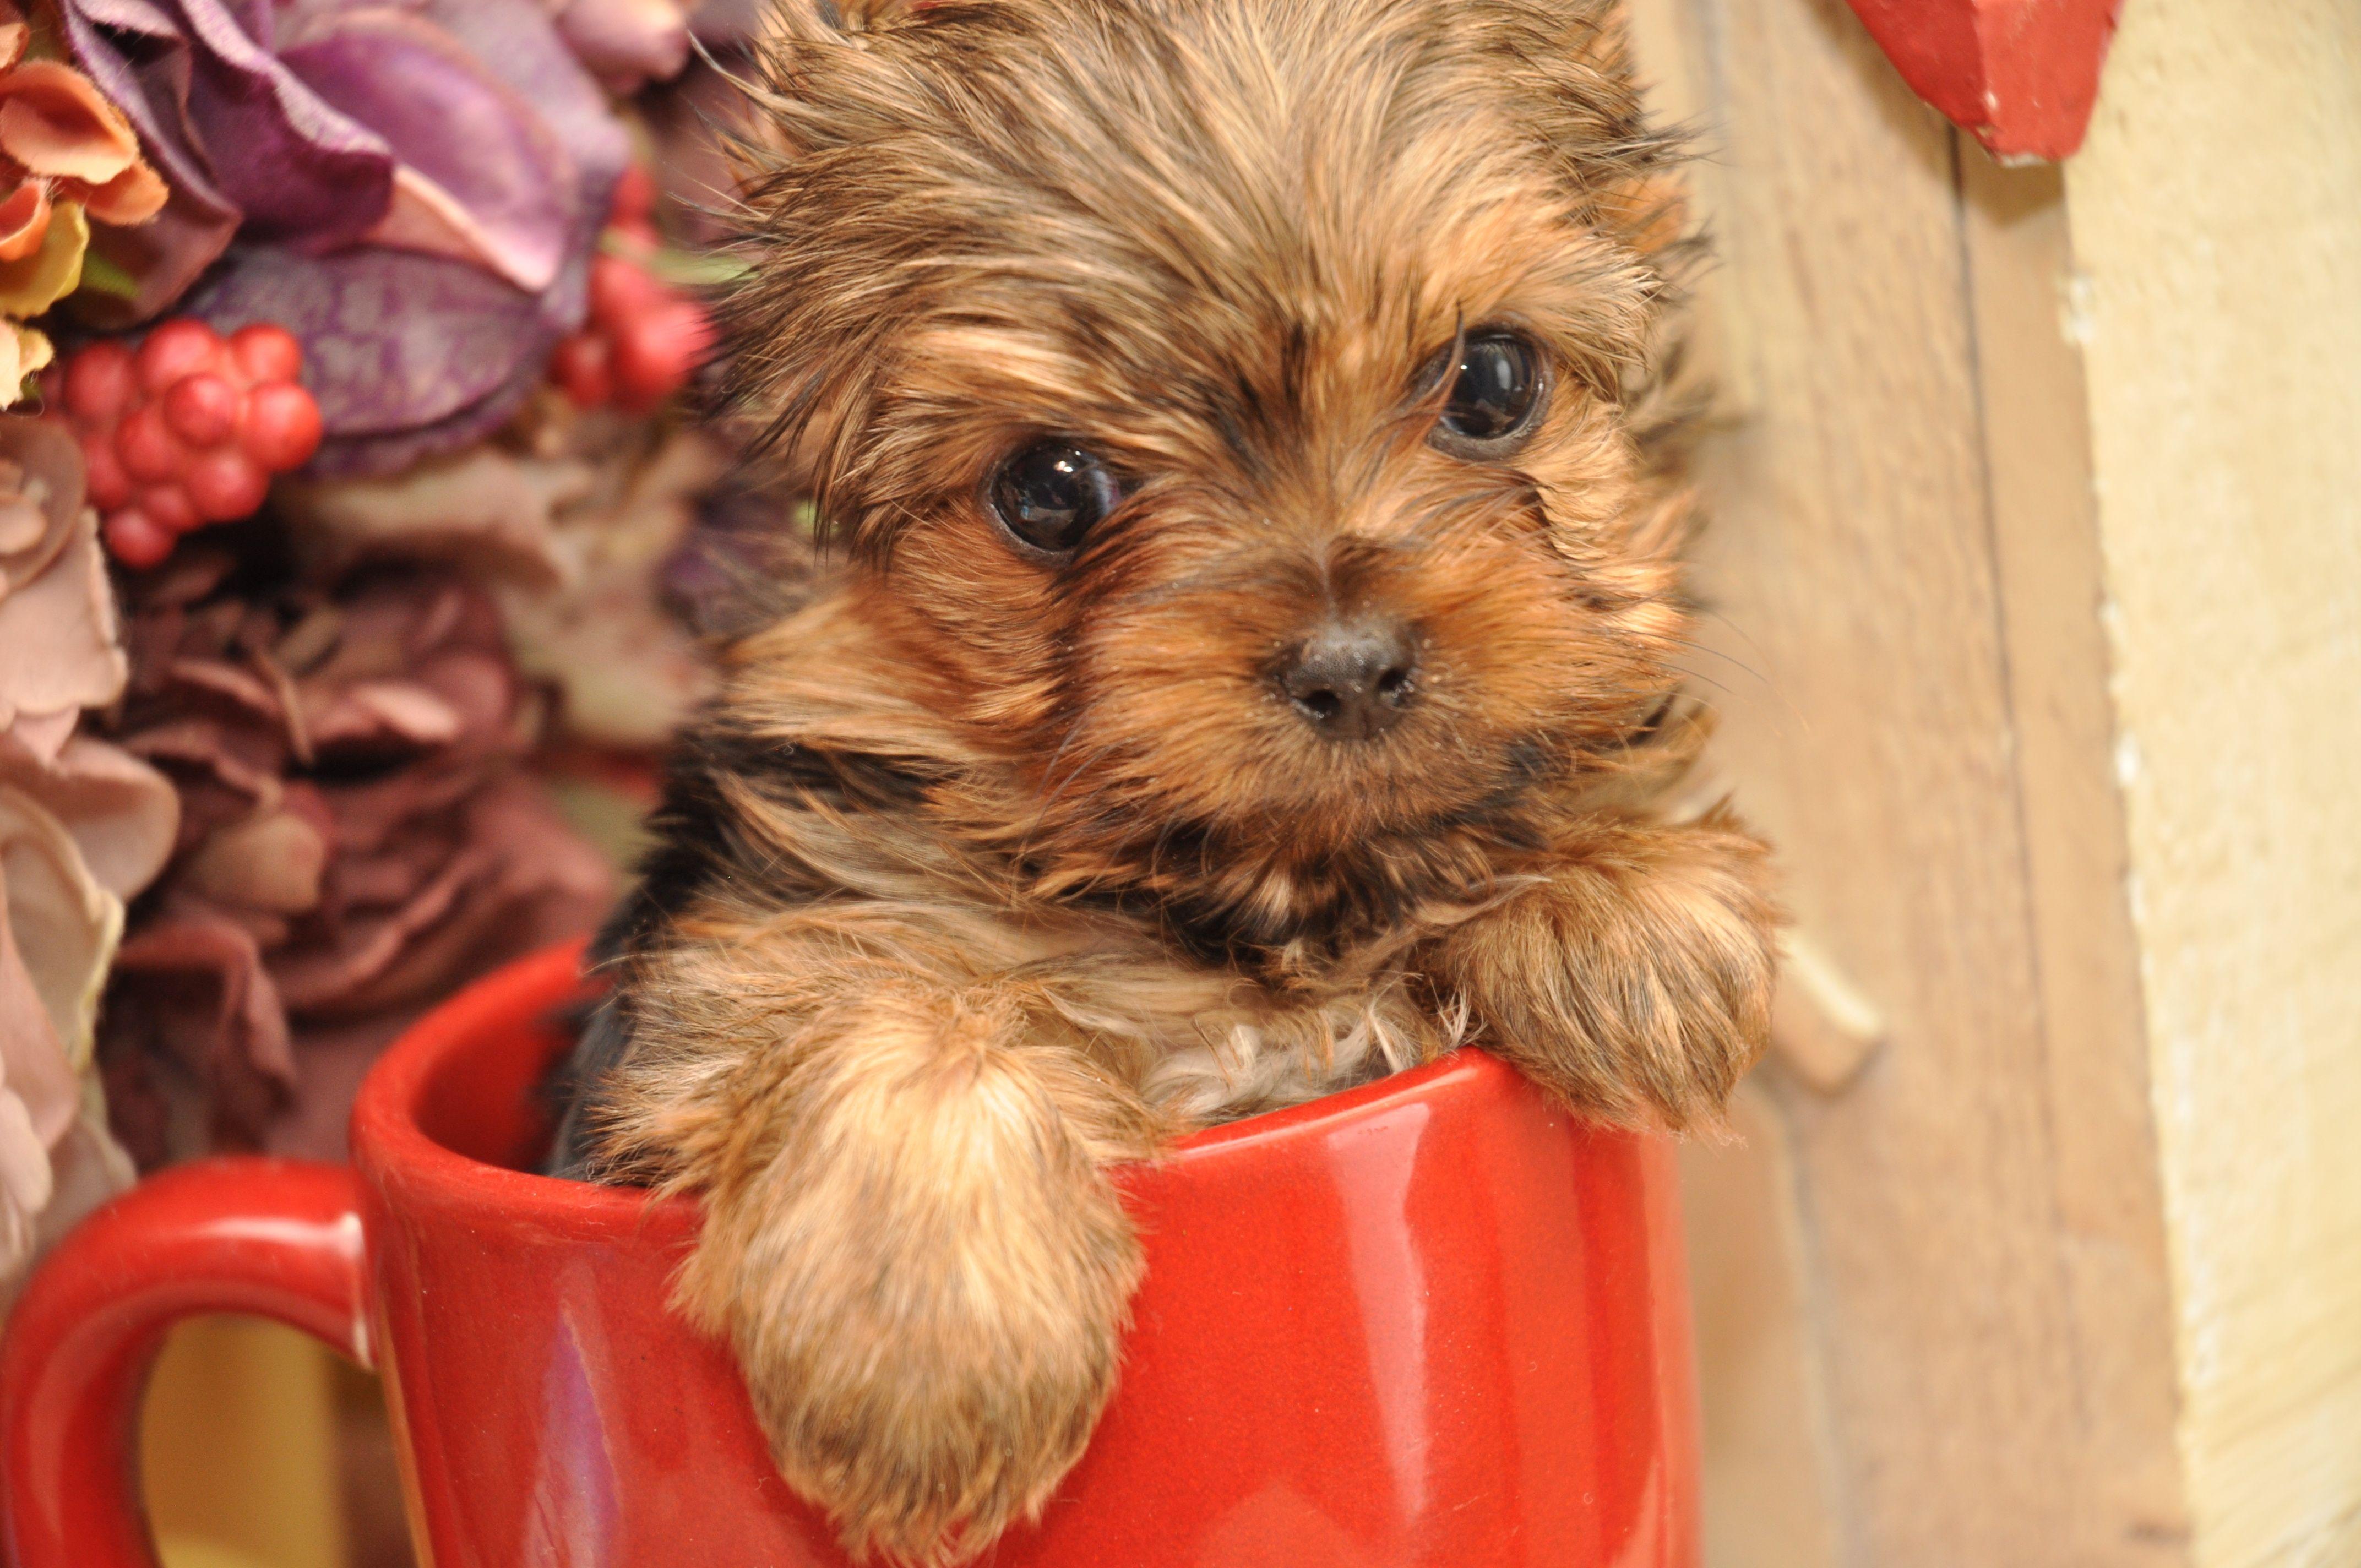 cute tcup girl Teacup yorkie, Teacup yorkie puppy